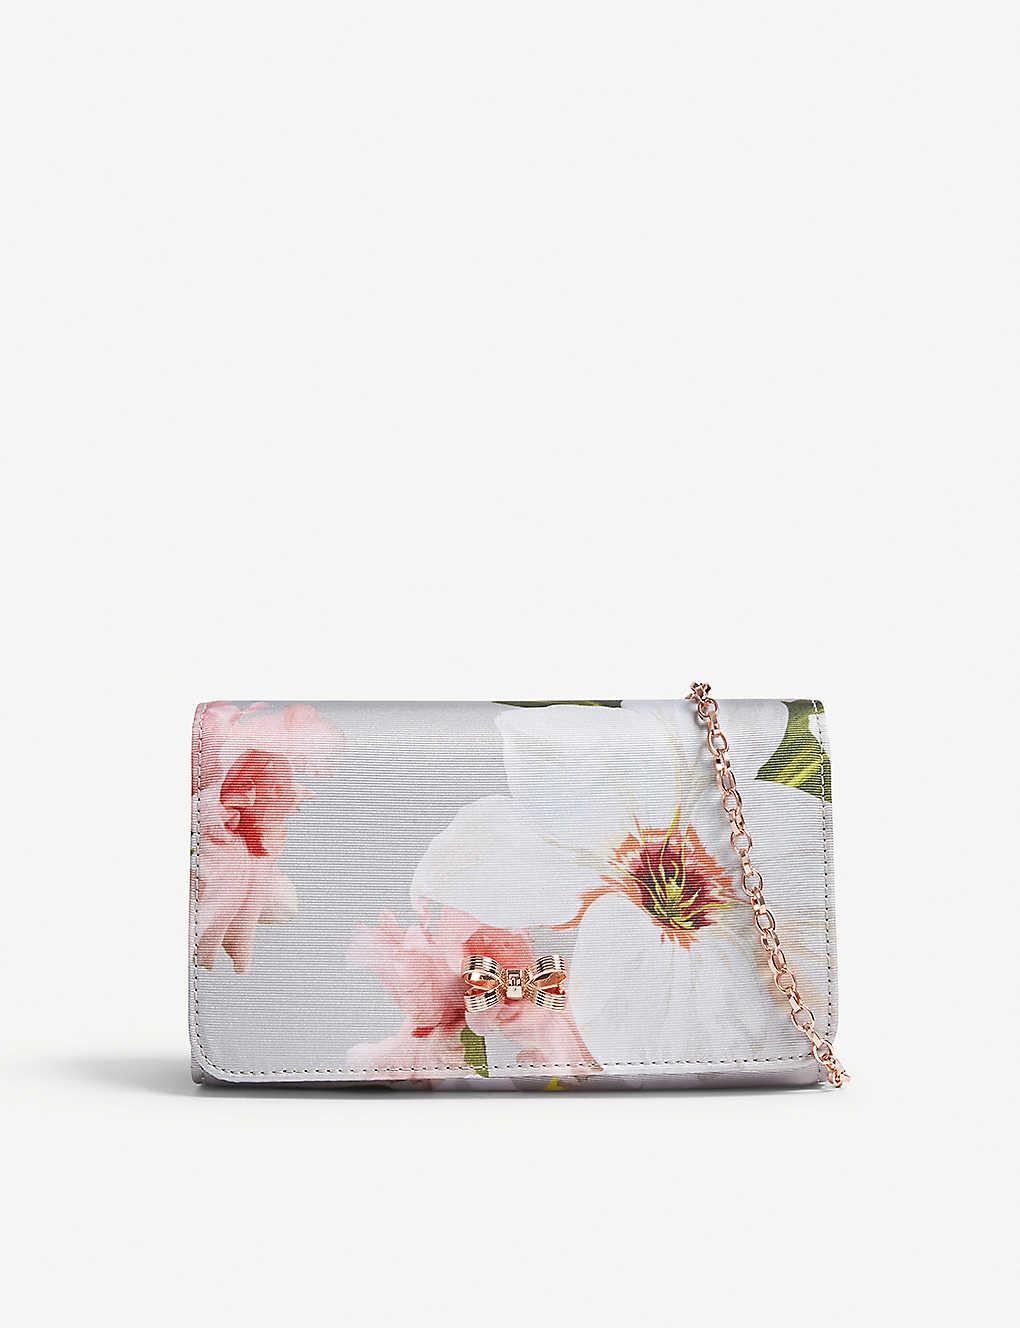 9a523a1c503 TED BAKER - Melodie floral print cross-body bag | Selfridges.com